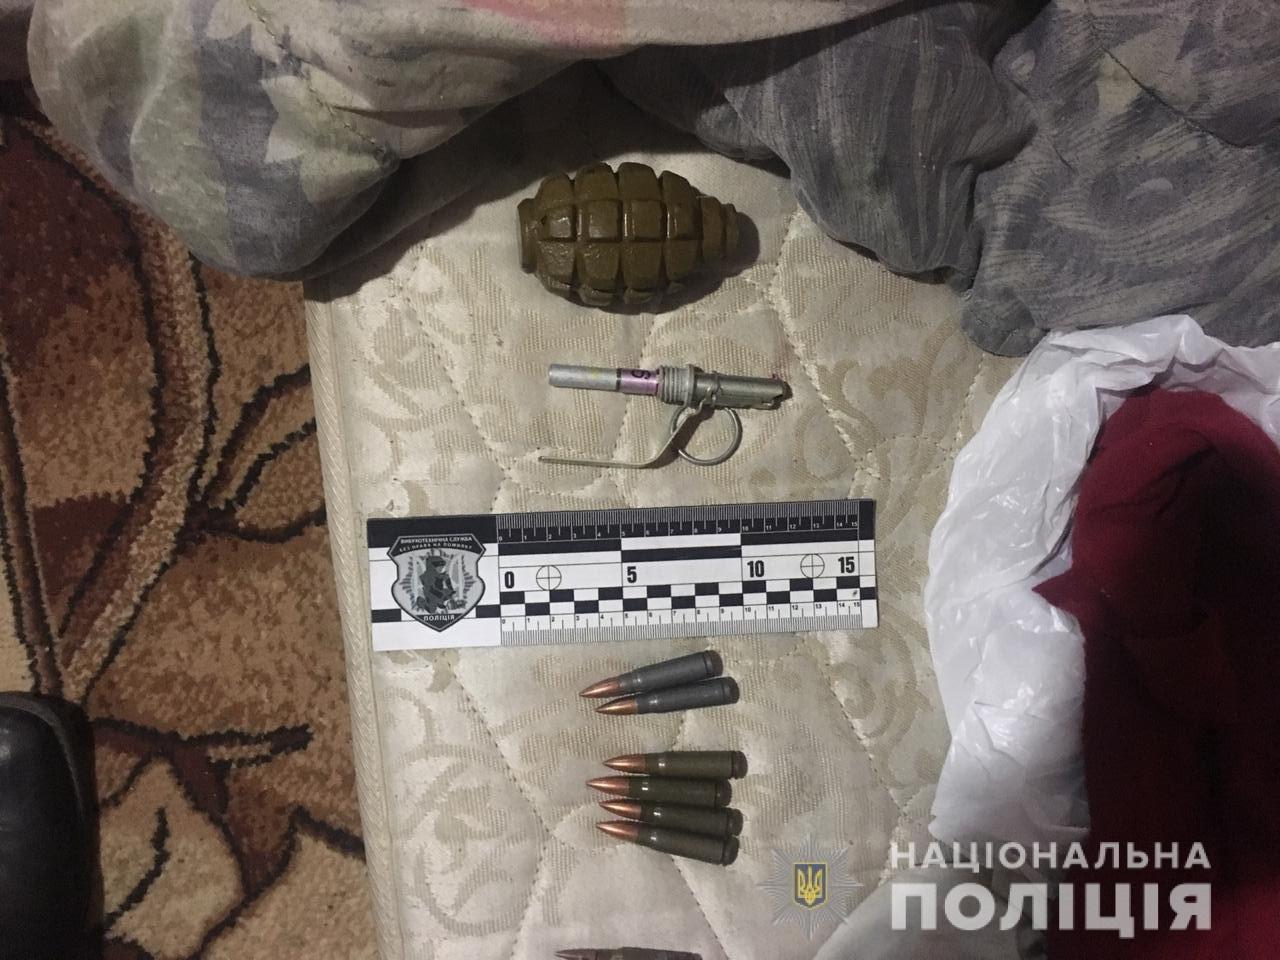 В Харькове рецидивист у себя дома хранил гранату и патроны, - ФОТО, фото-1